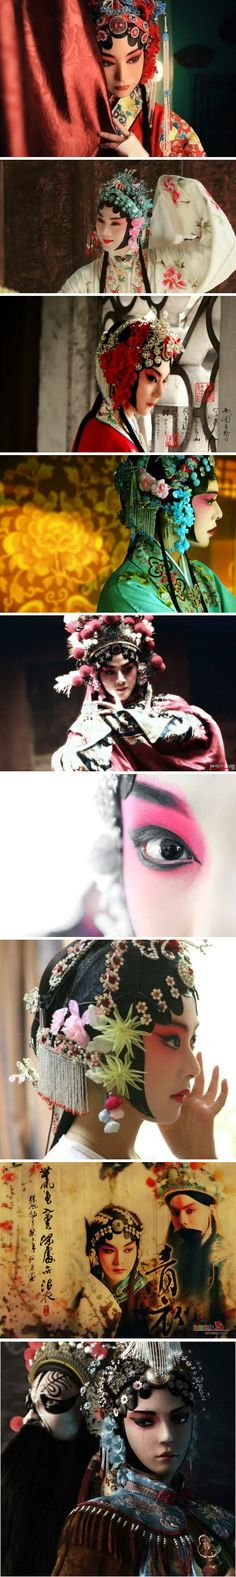 CultureInCart - Arts and craft, symbols,Folk art and culture : Beijing opera Chinese Design, Chinese Style, Beijing, Turandot Opera, 3 4 Face, Taiwan, Chinese Element, Chinese Opera, Ancient China